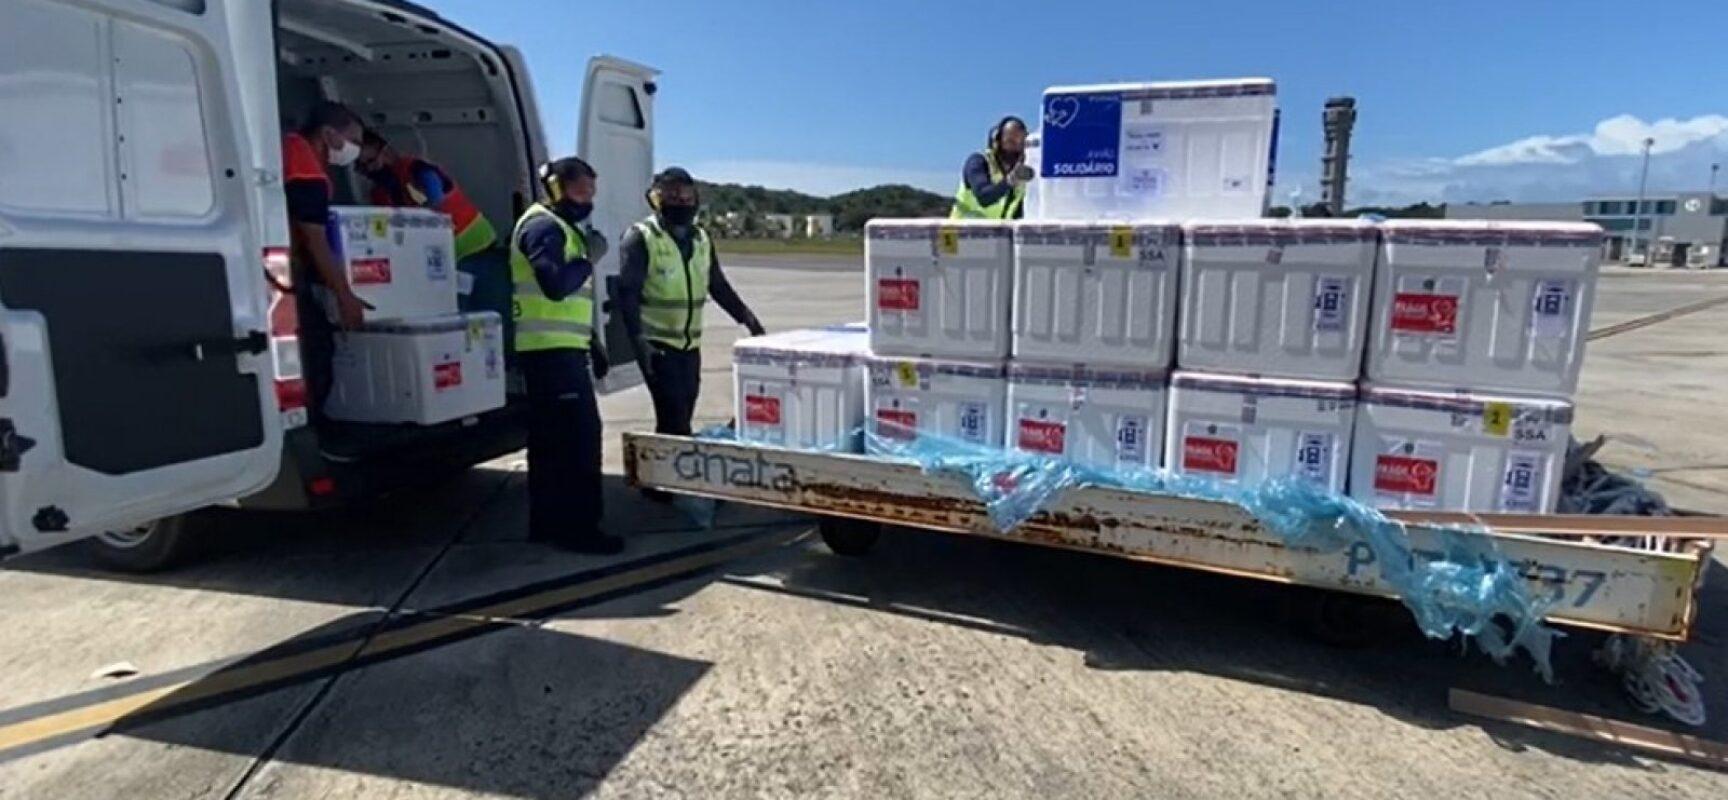 Bahia receberá cerca de 200 mil doses de vacinas contra Covid-19 nesta segunda-feira